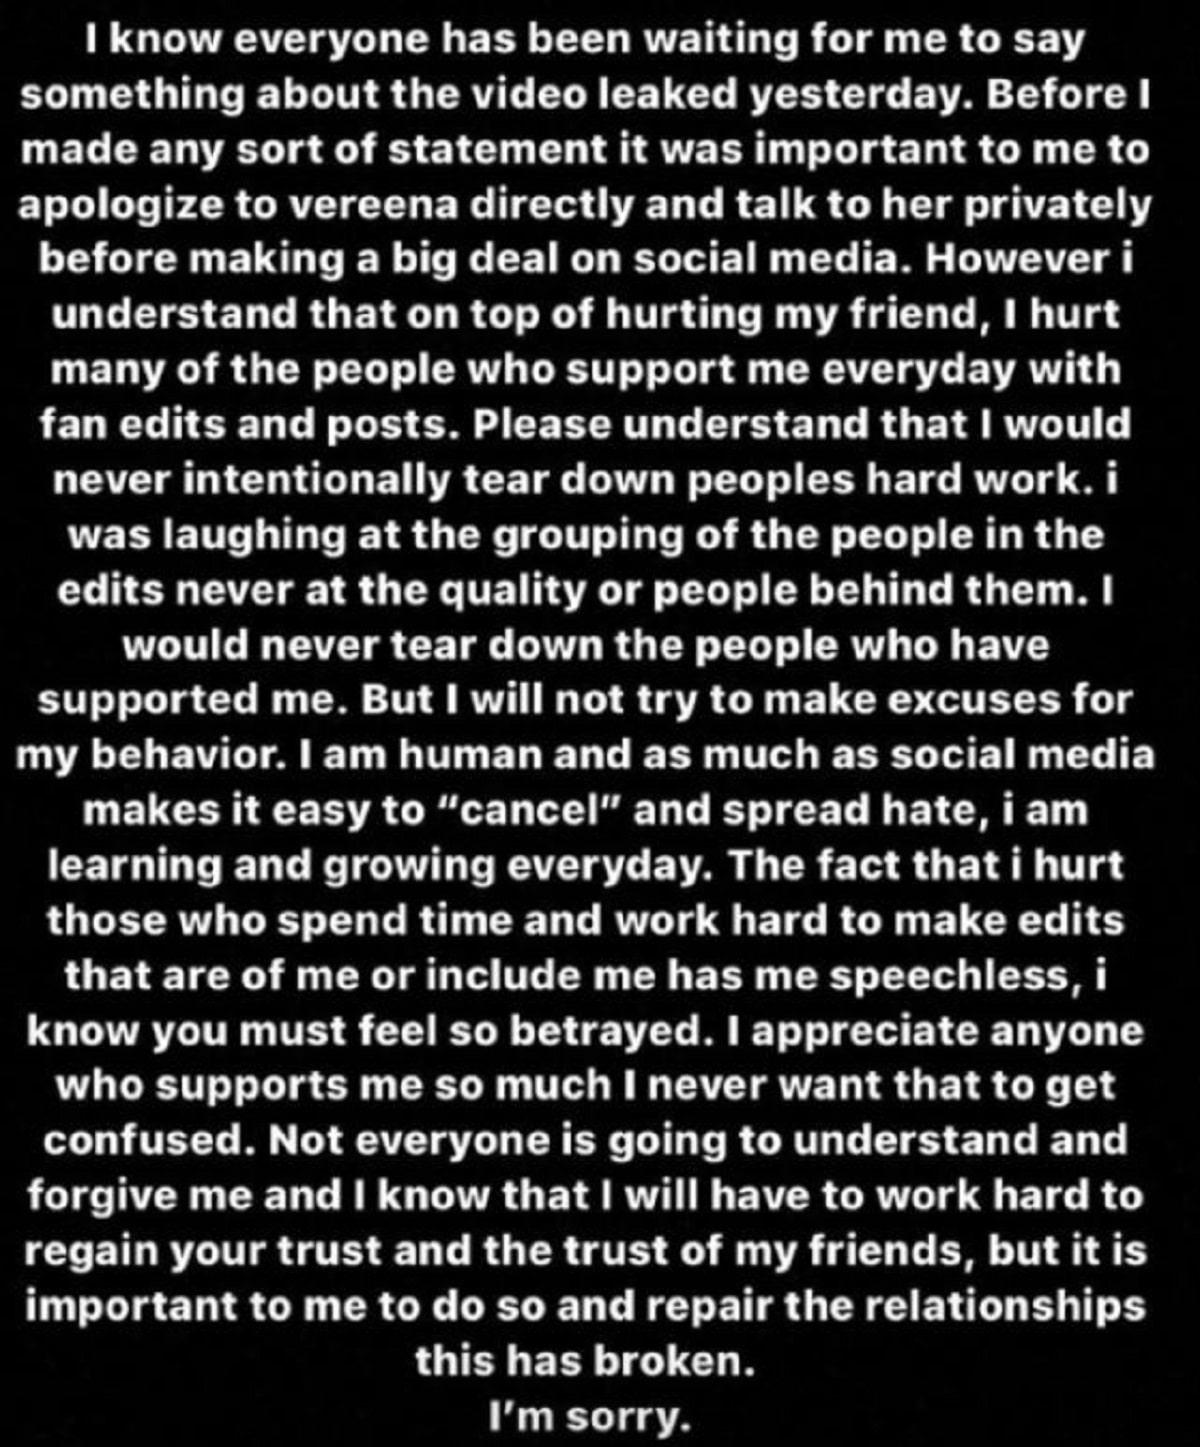 Hannah Meloche's apology